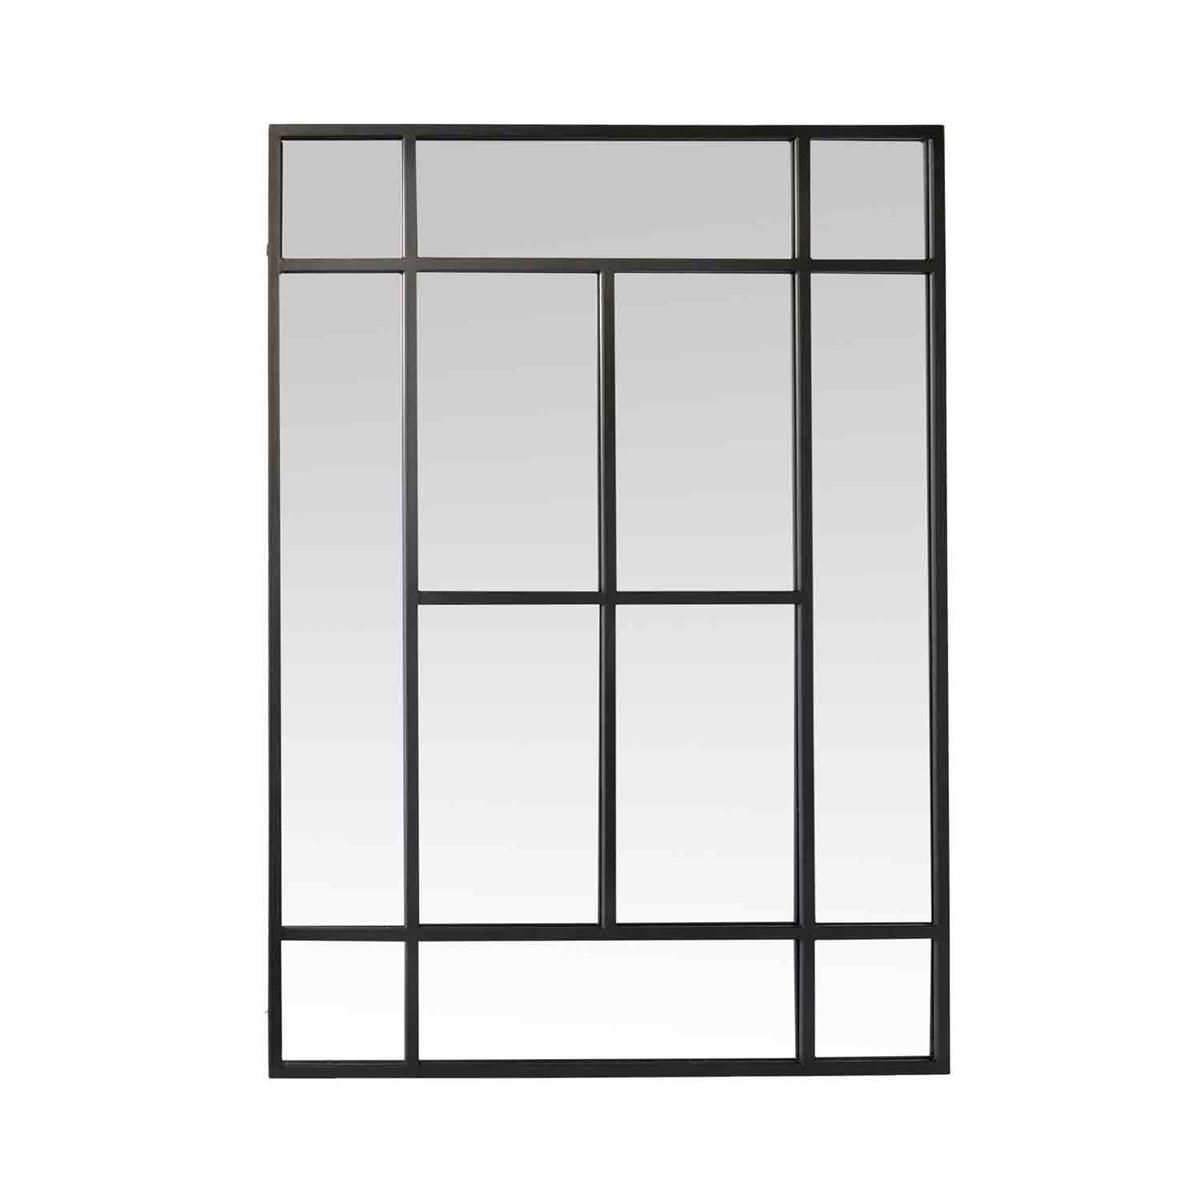 Miroir convexe en Métal Noir